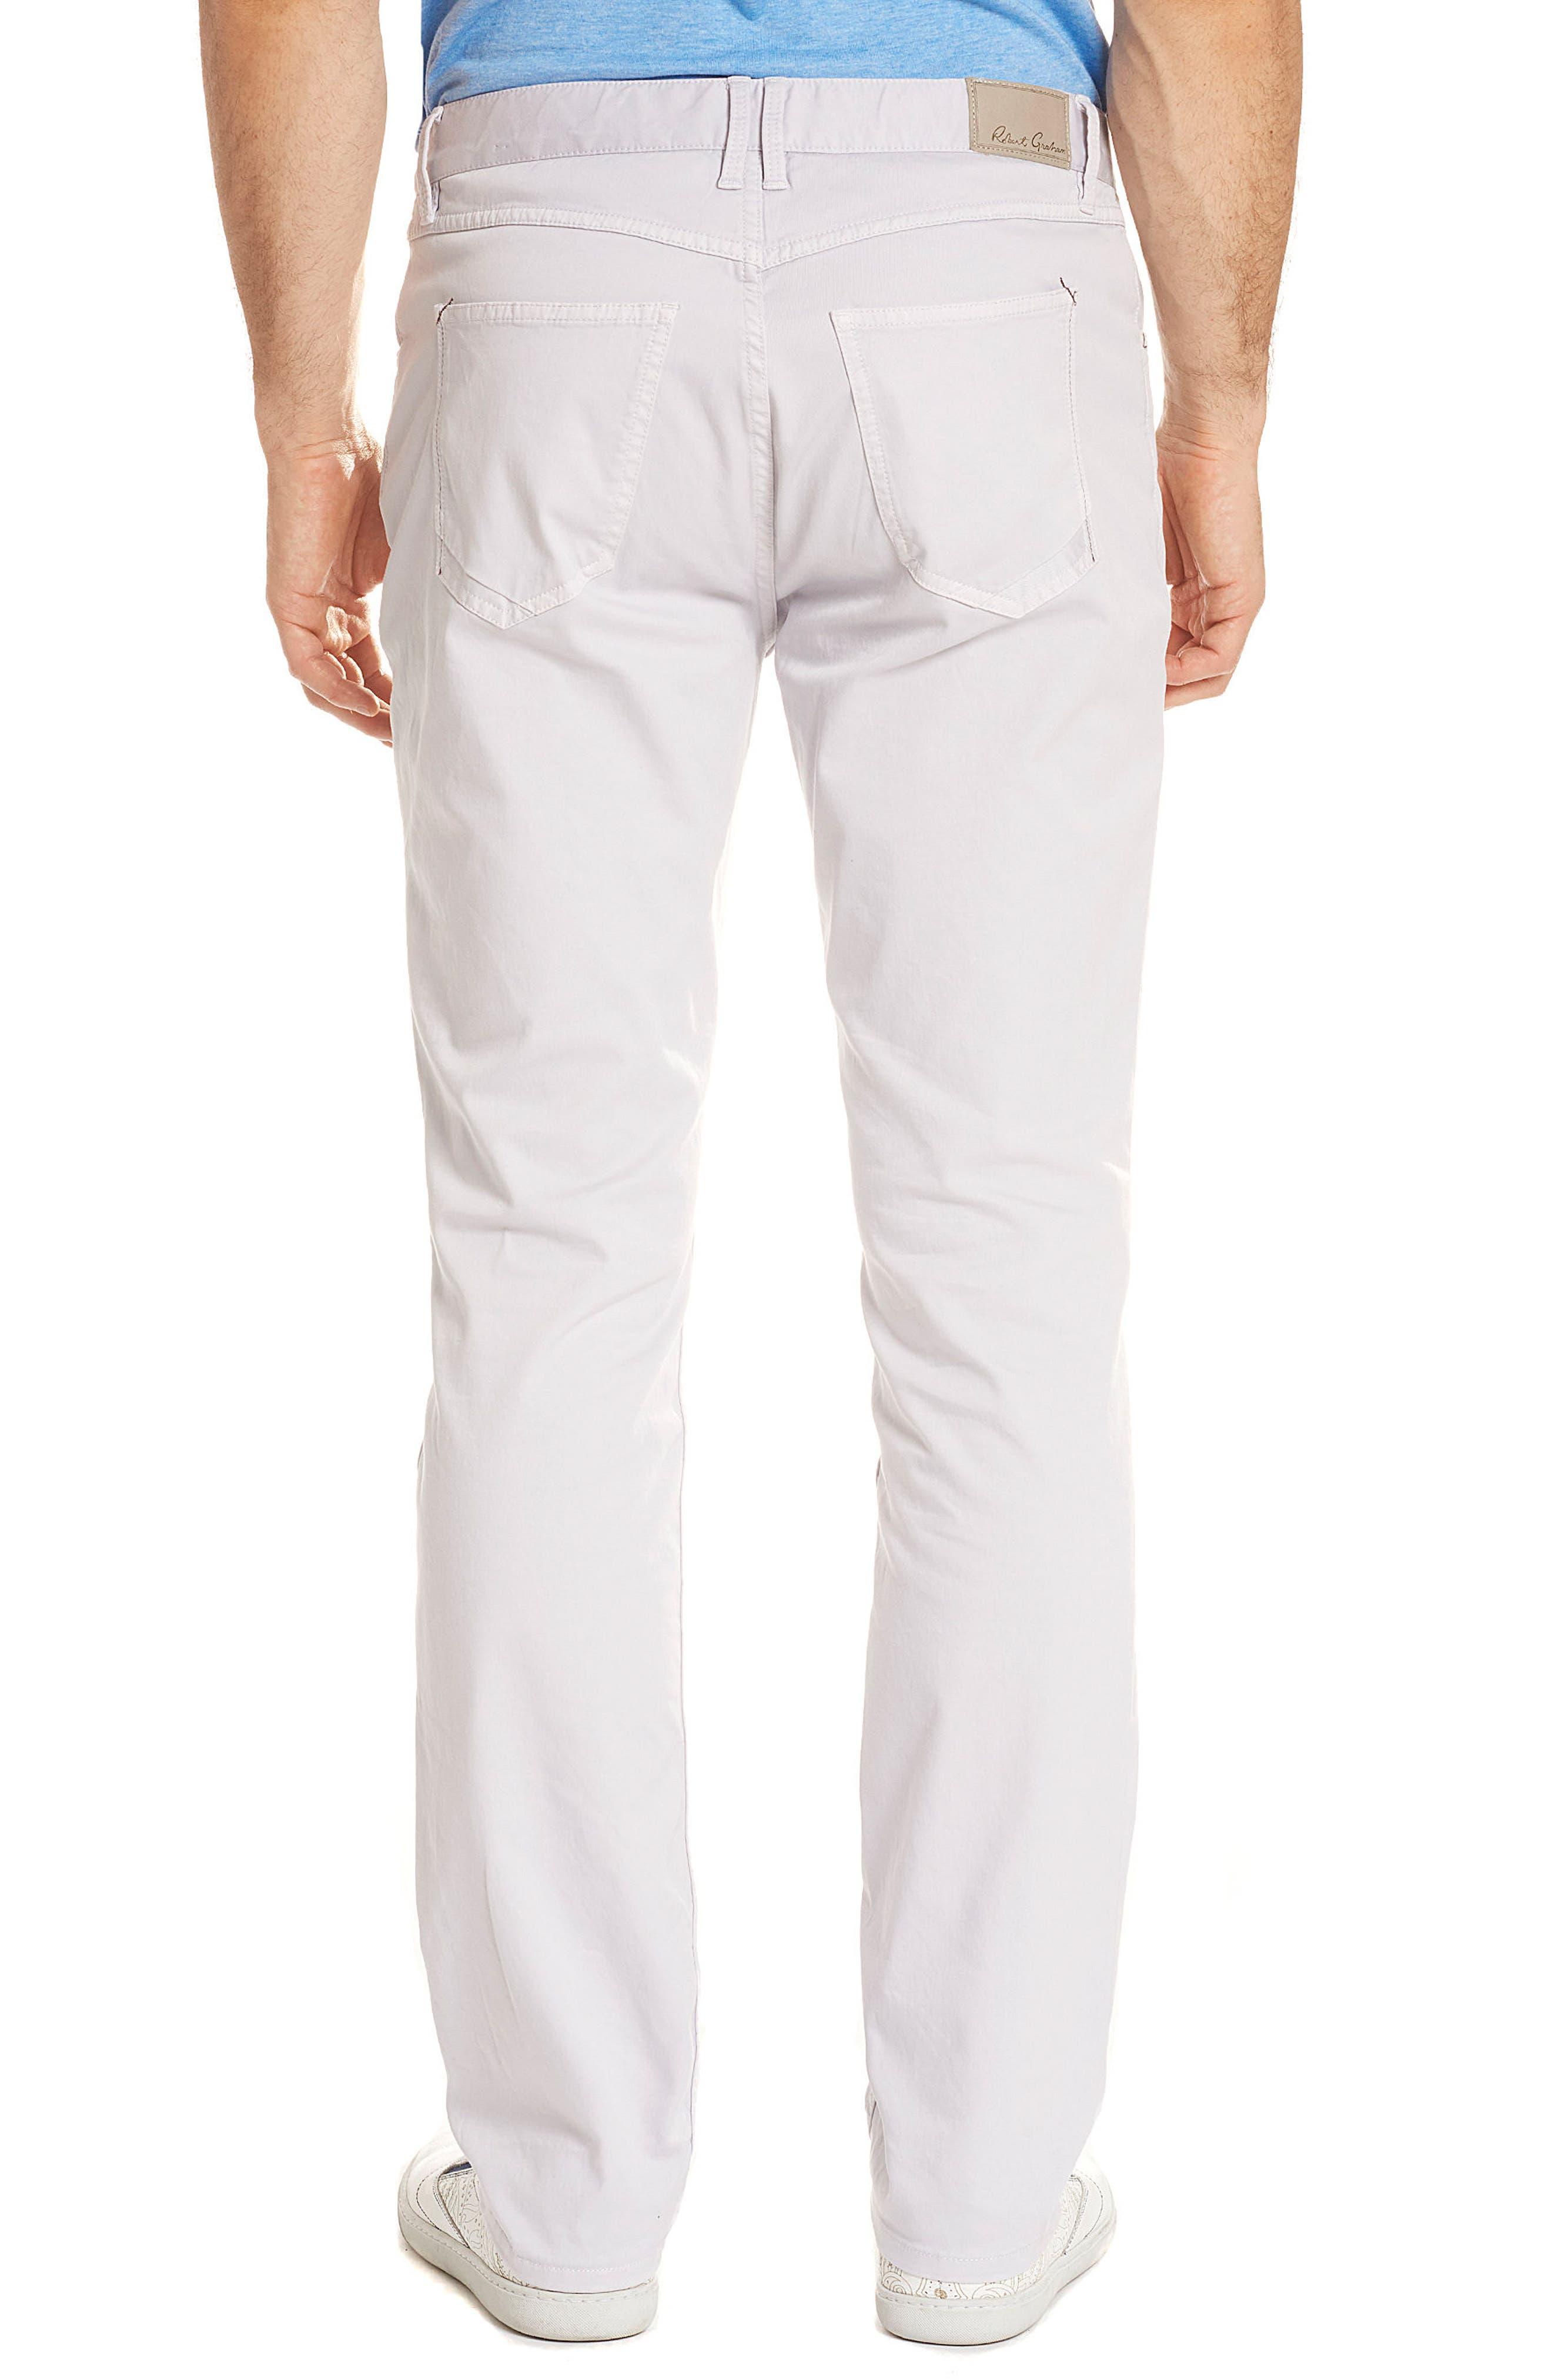 Marti Tailored Fit Pants,                             Alternate thumbnail 2, color,                             059